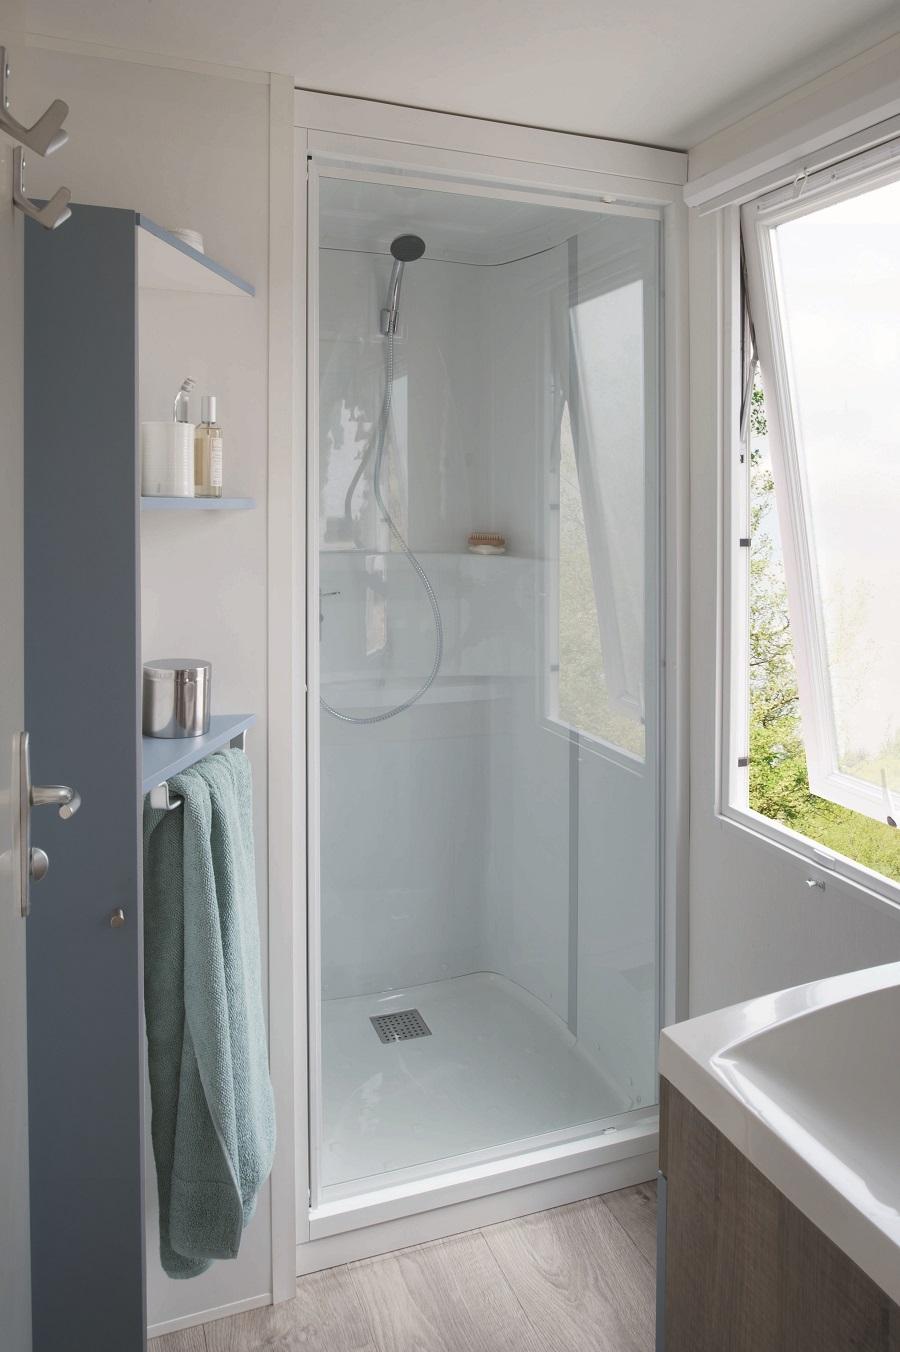 Location en camping montignac camping la nouvelle croze - Mobil home chambres salles de bain ...